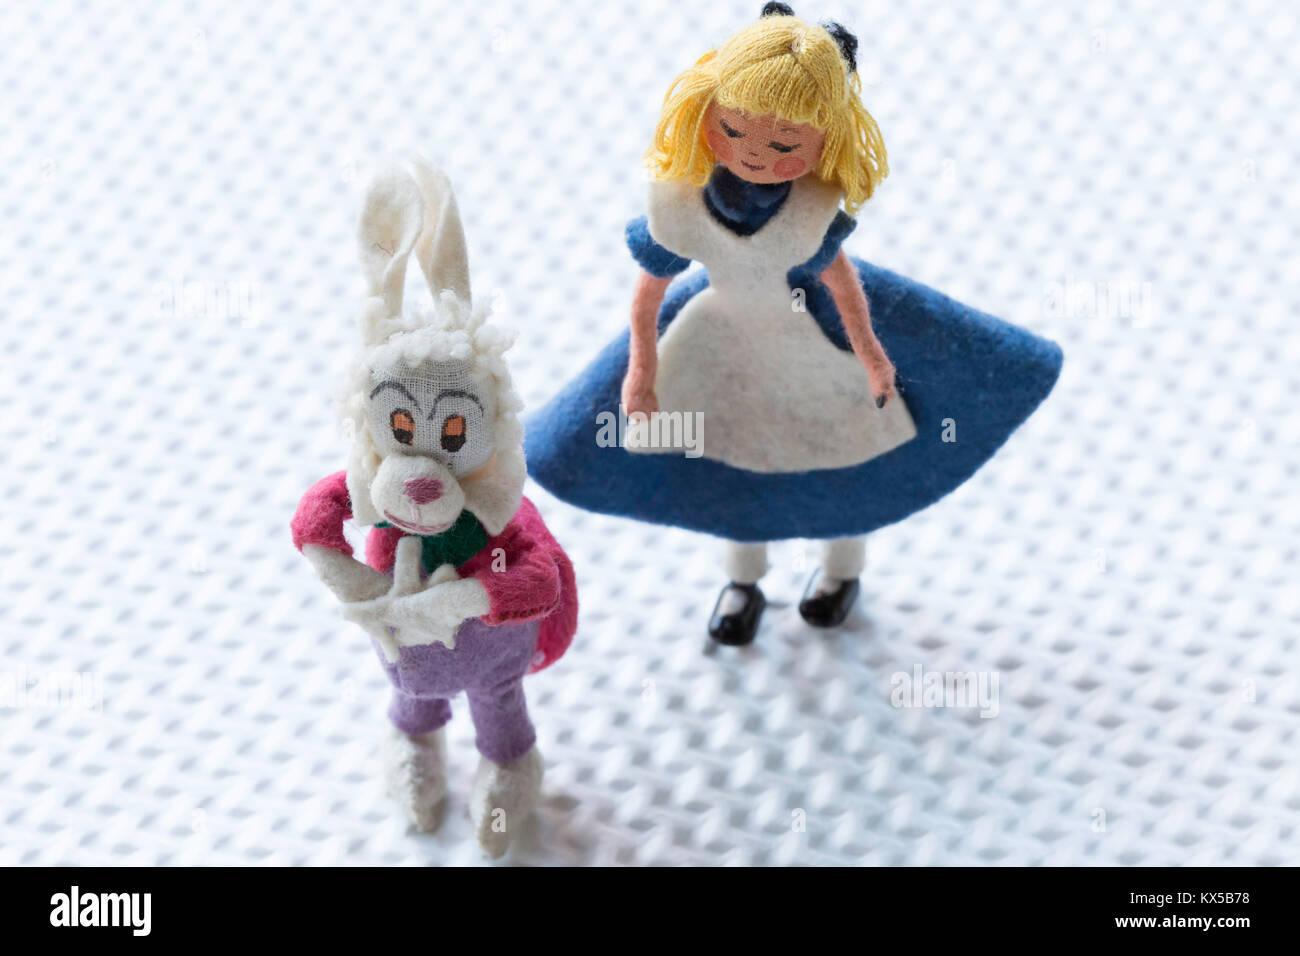 'Alice in Wonderland' Vintage personnages de contes Photo Stock